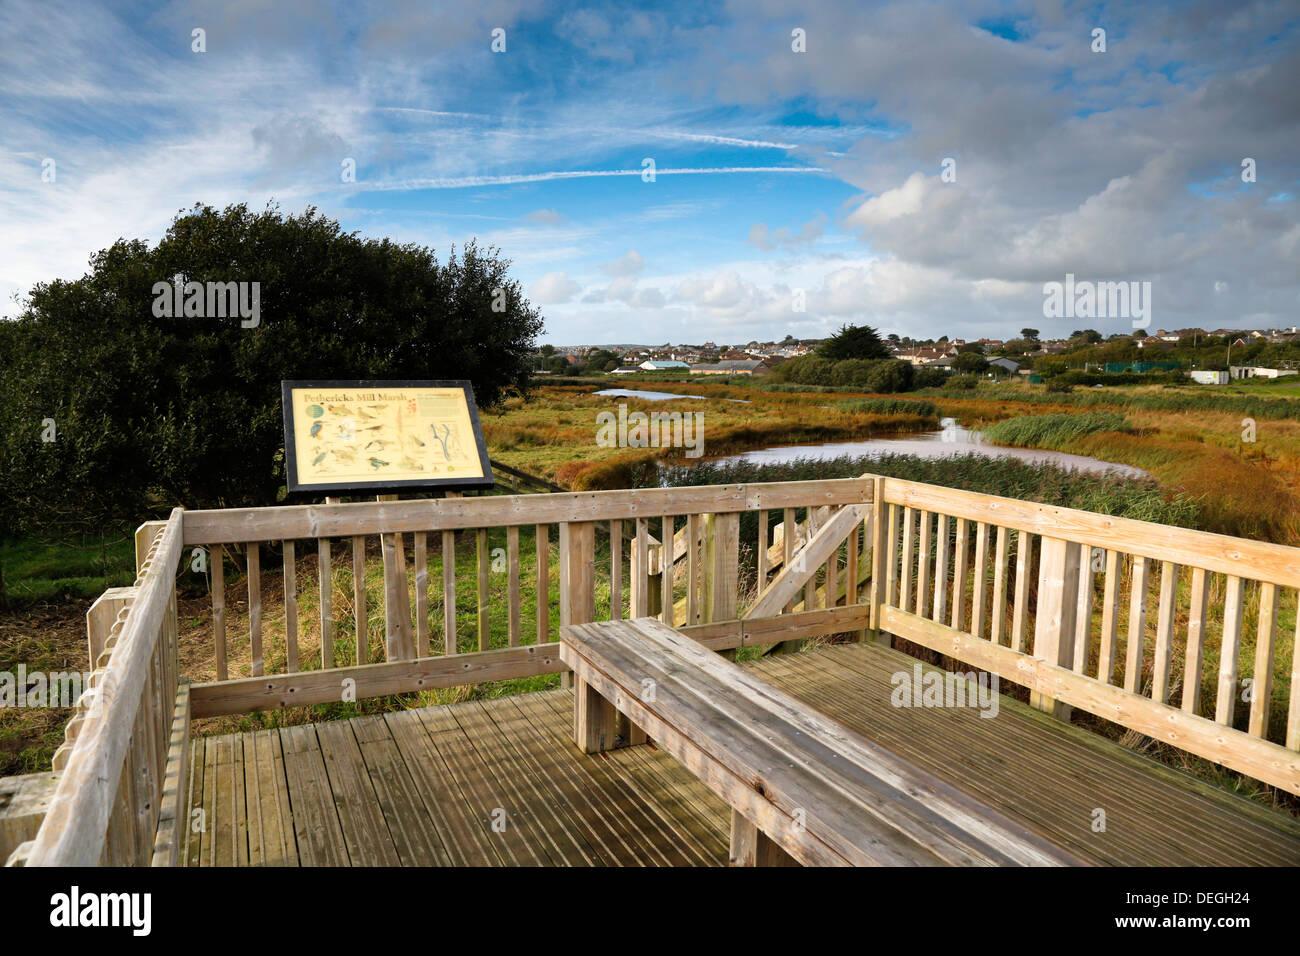 Bude Sümpfen und Kanal; Aussichtspunkt; Cornwall; UK Stockbild